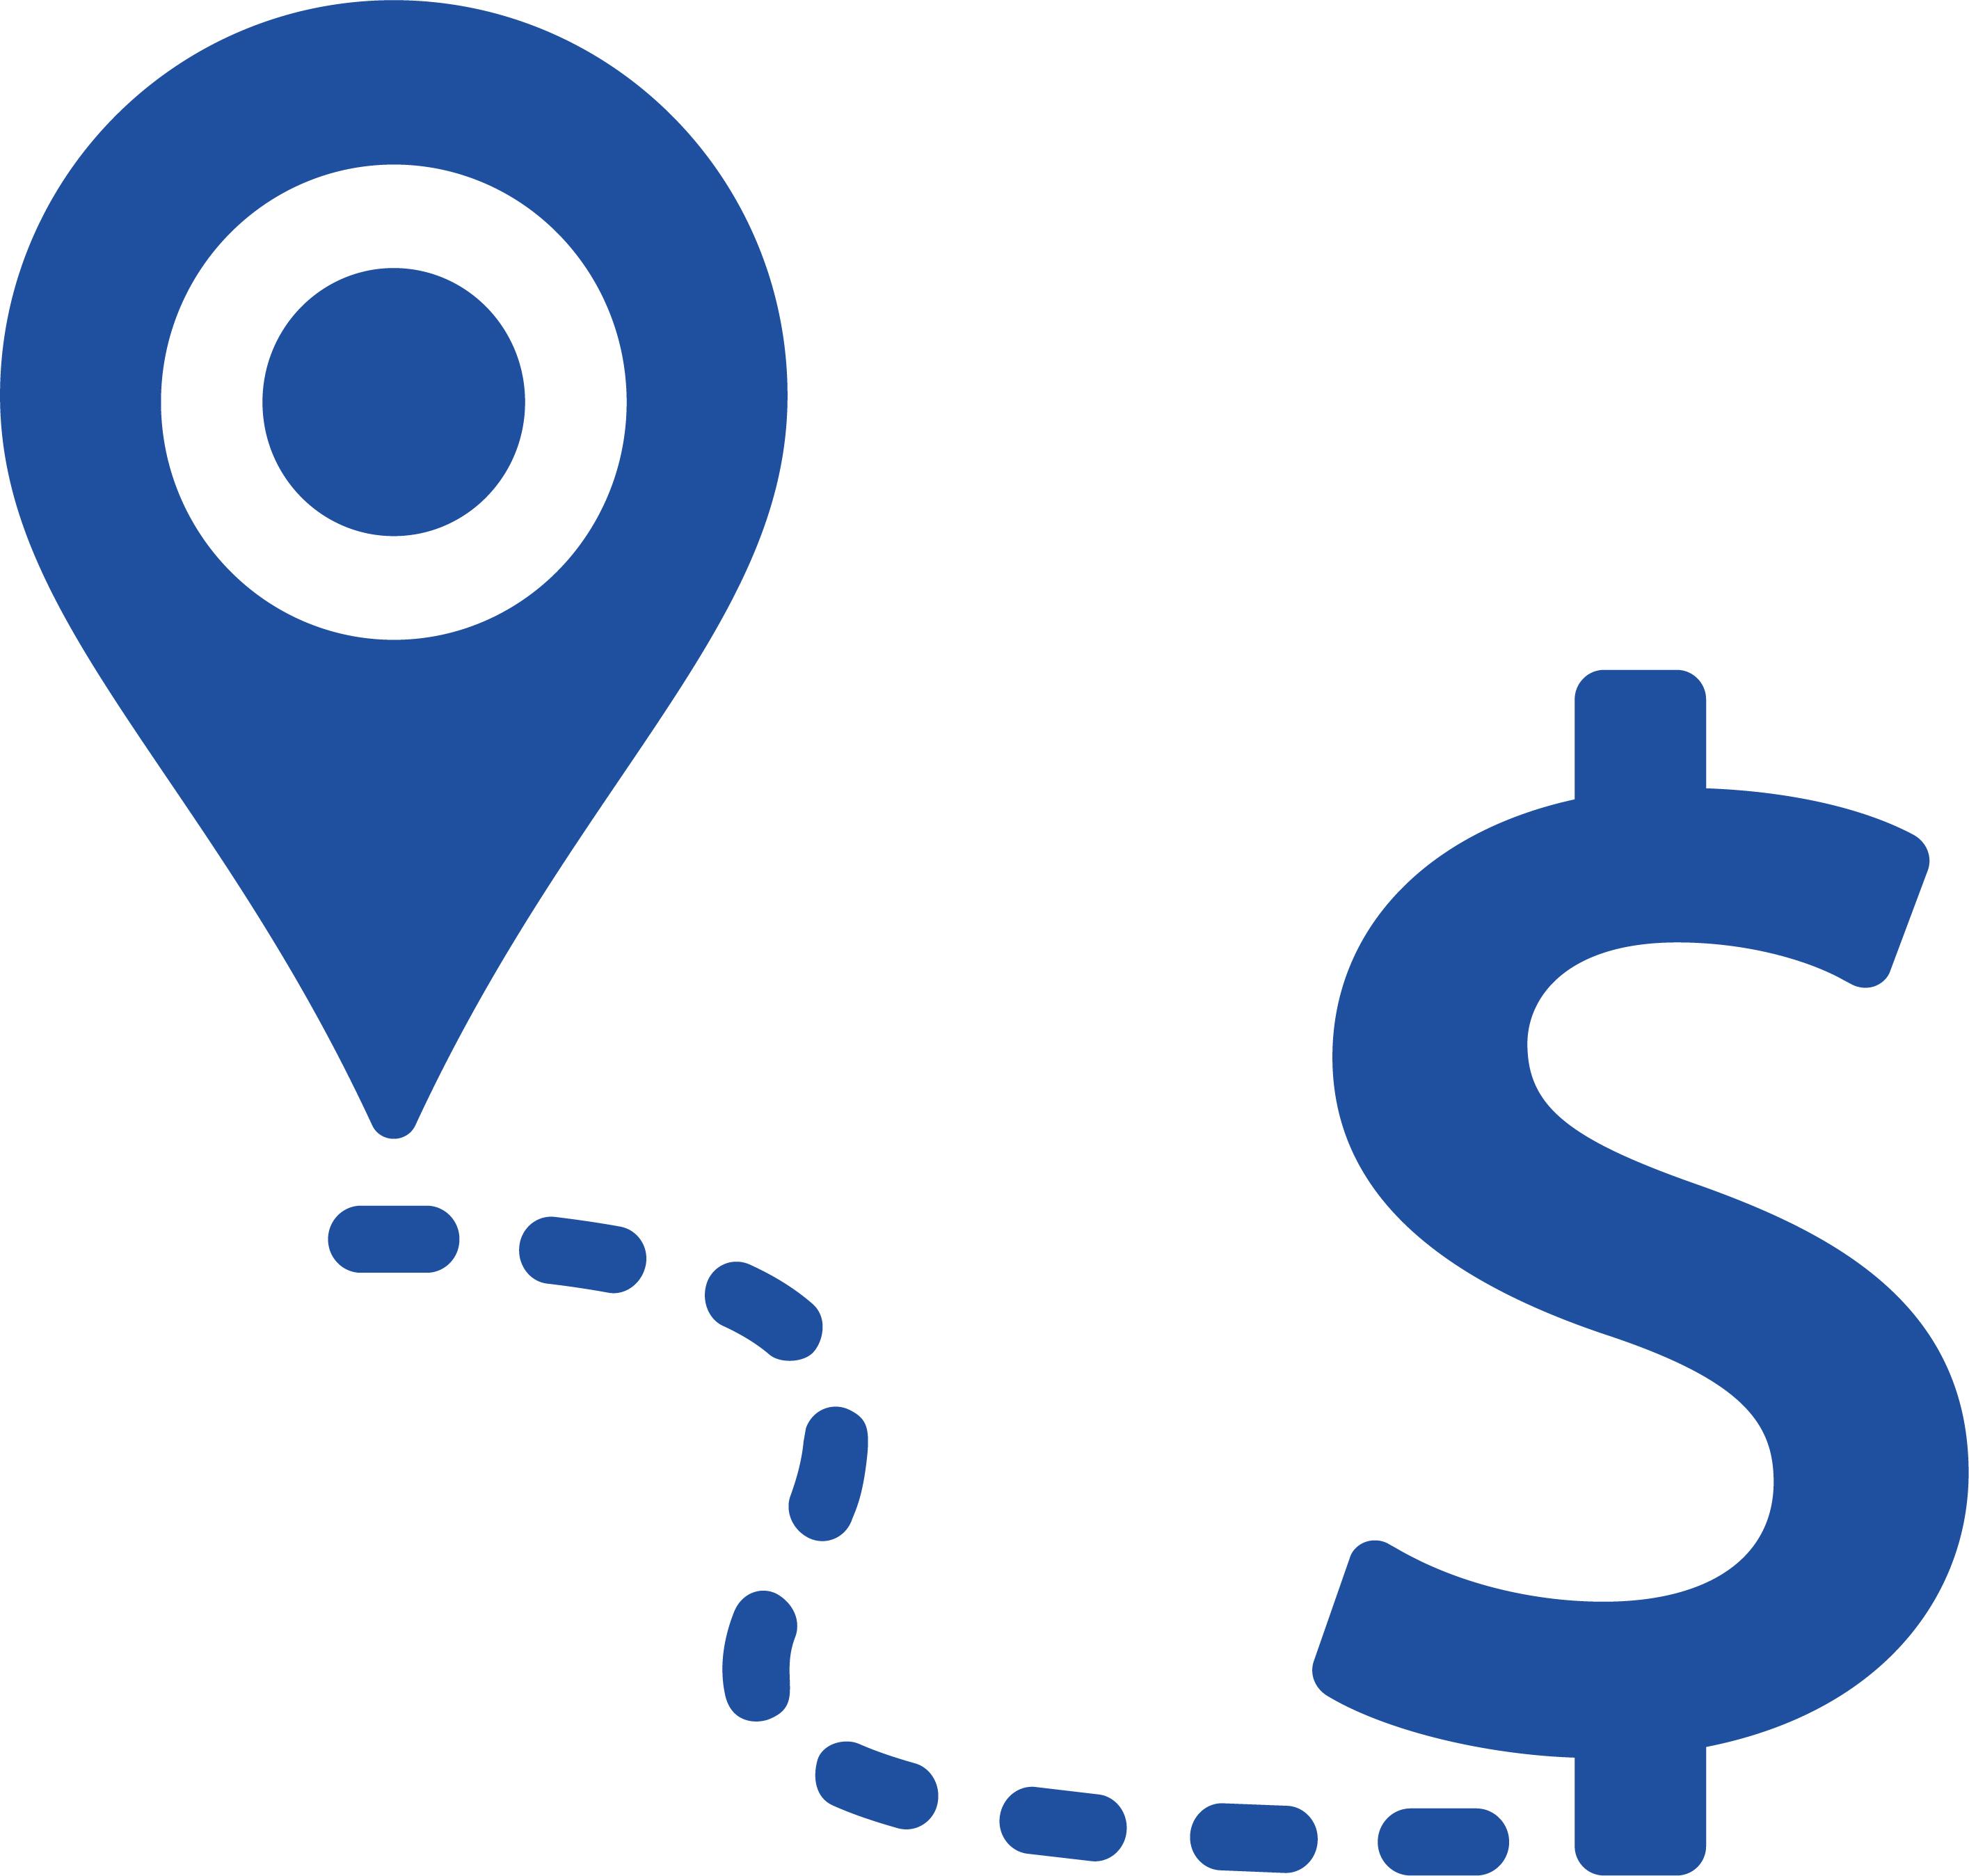 where to buy real estate in York Region: Georgina